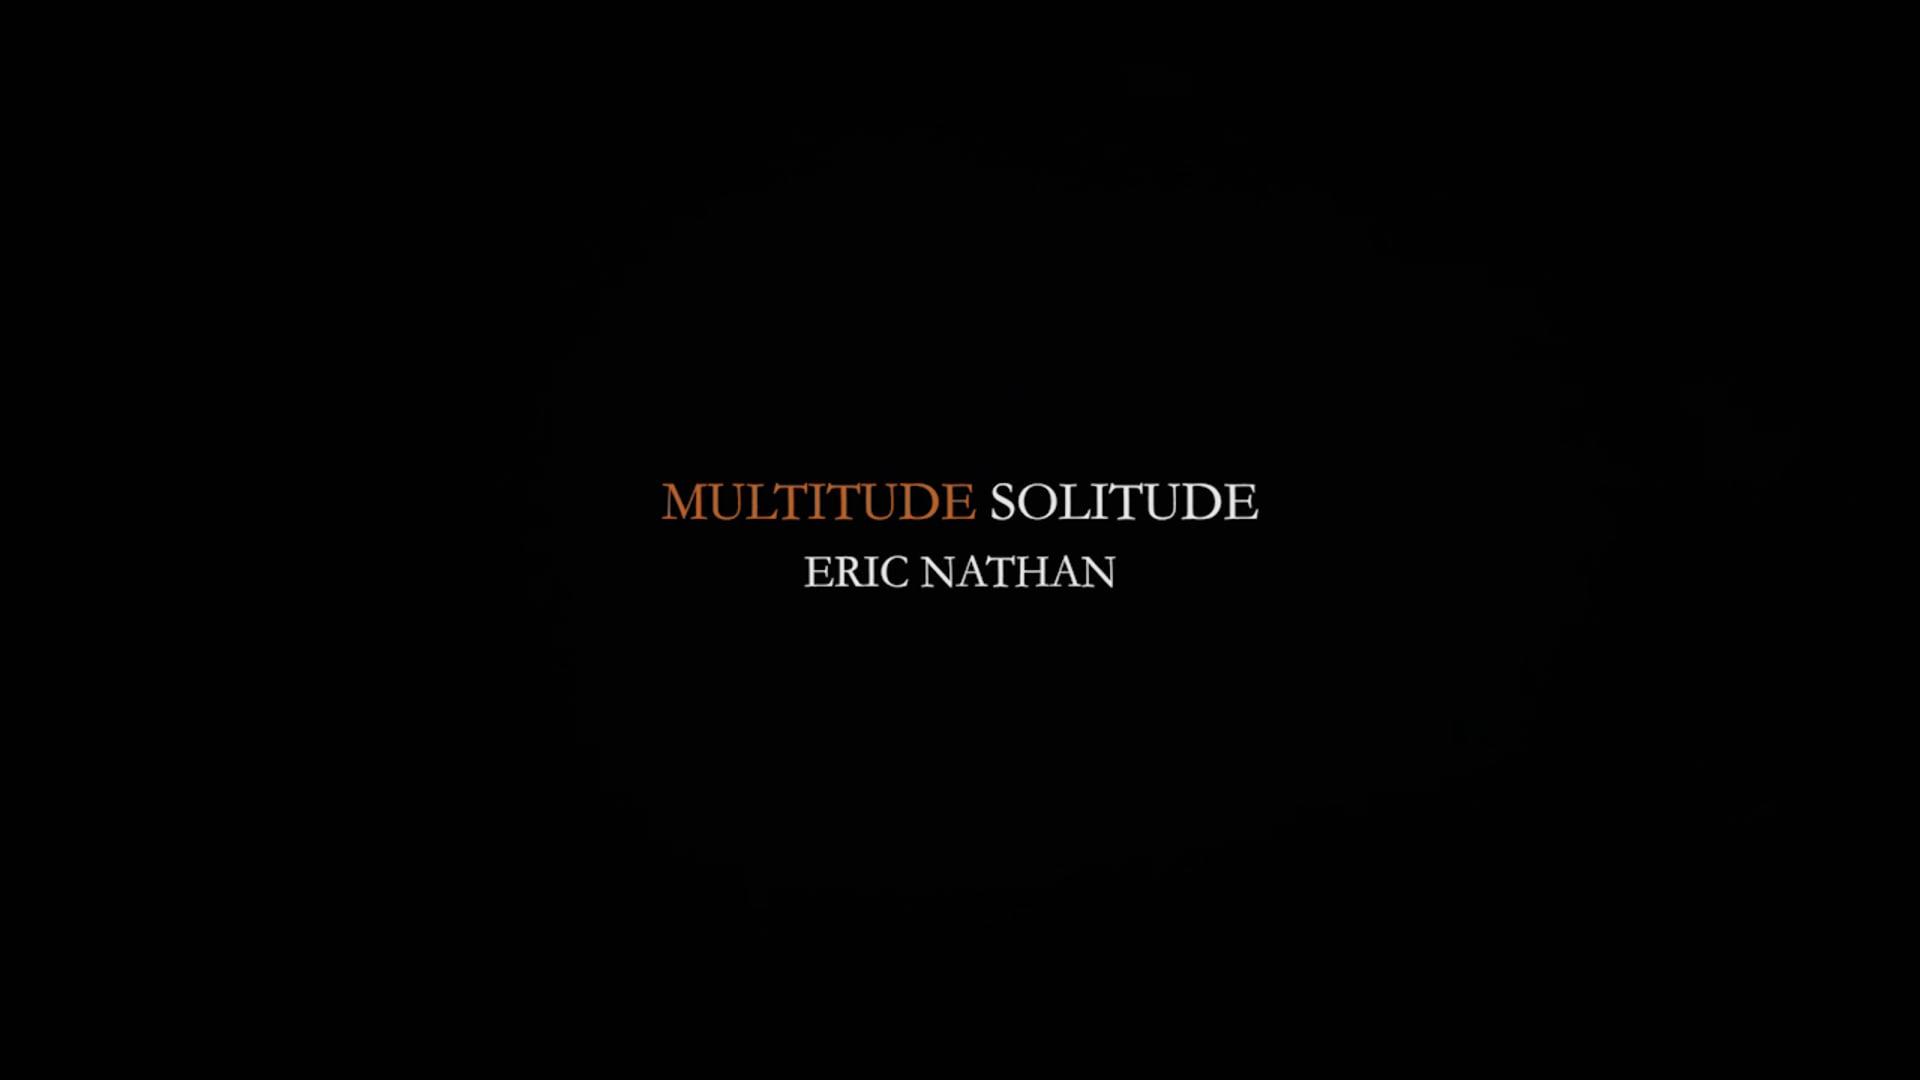 MULTITUDE SOLITUDE: Eric Nathan